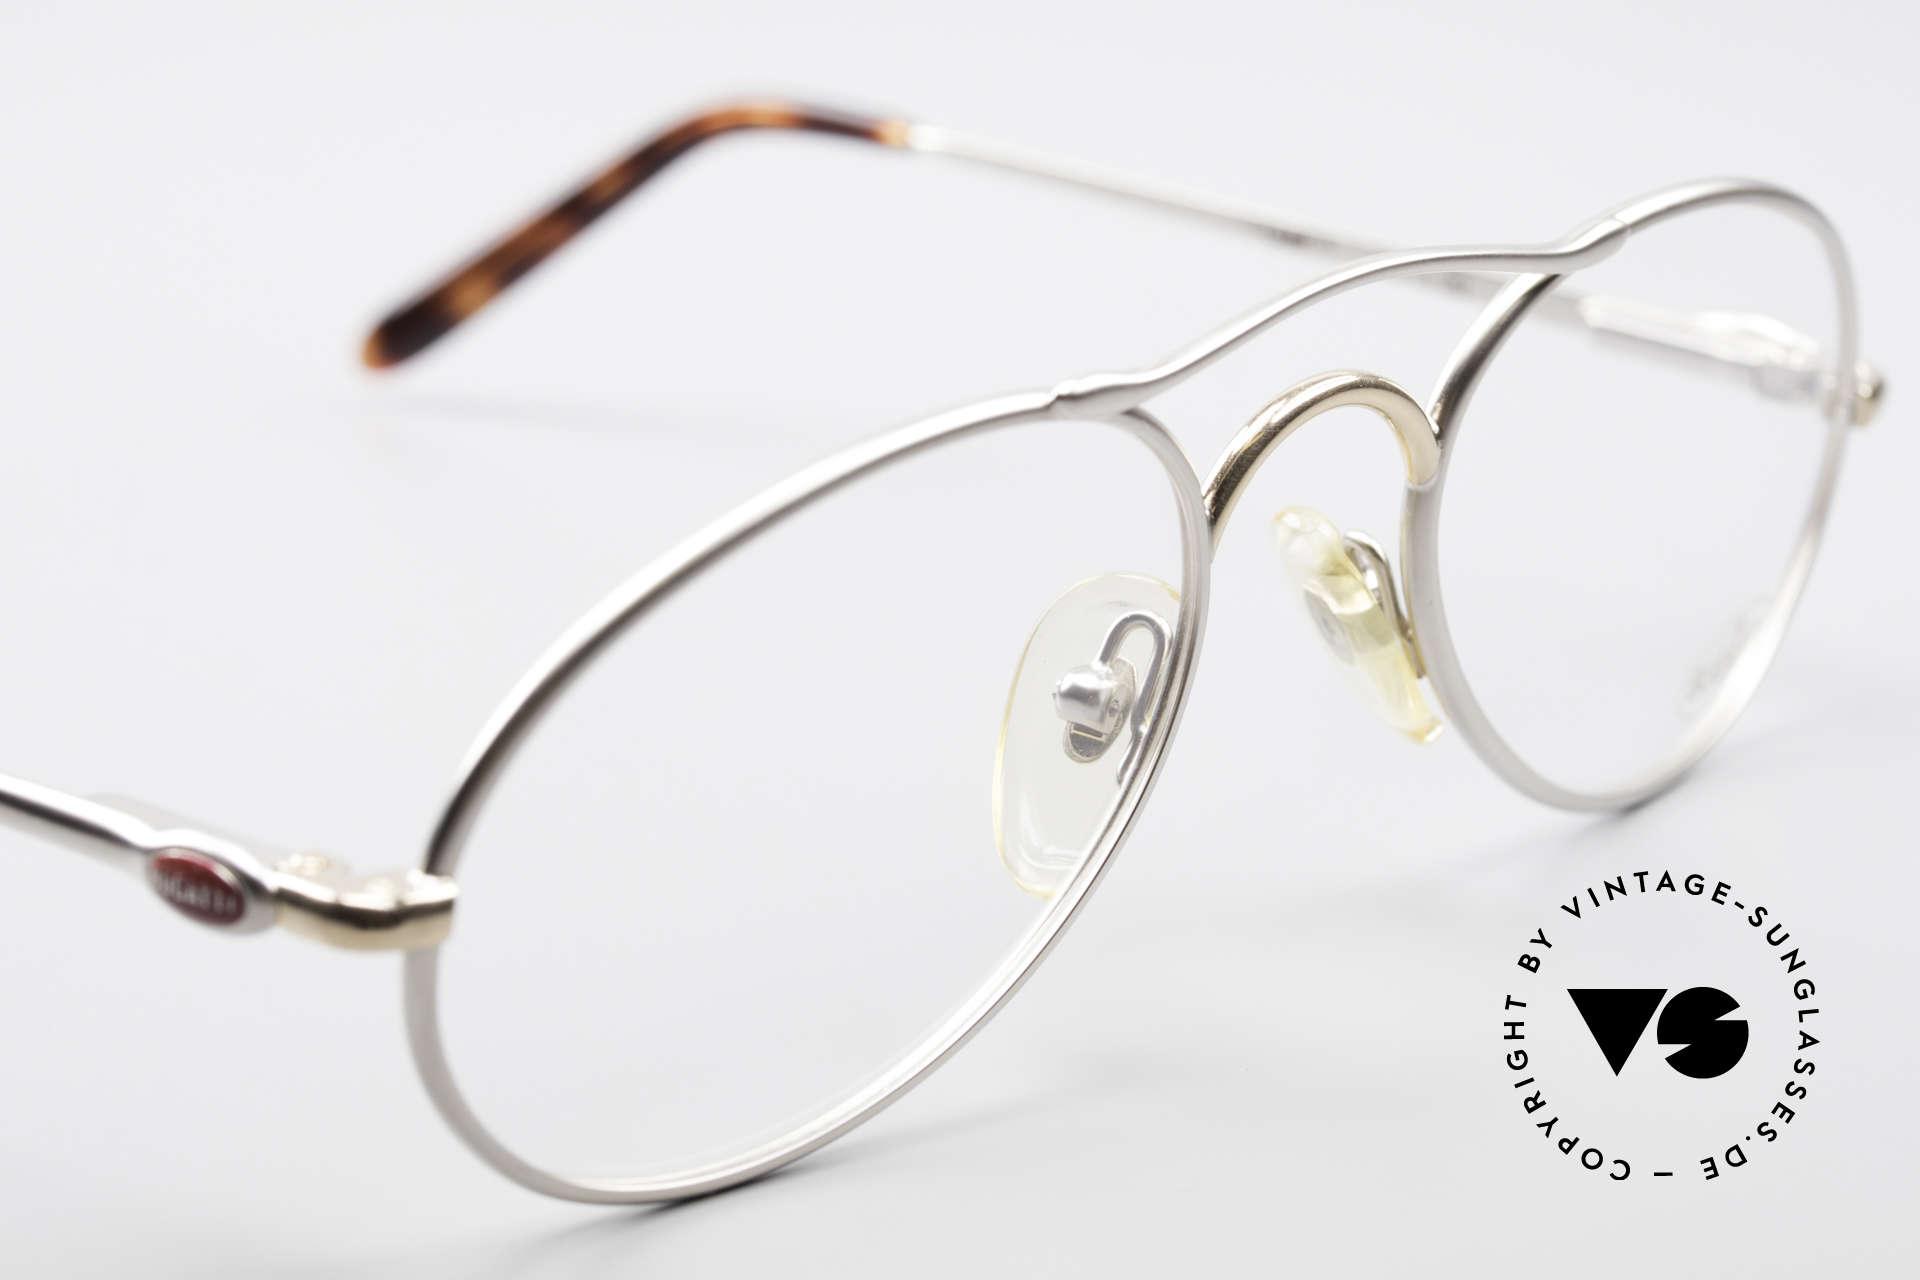 Bugatti 23439 90's Luxury Glasses For Men, NO RETRO glasses, but an old 90's original; vertu, Made for Men